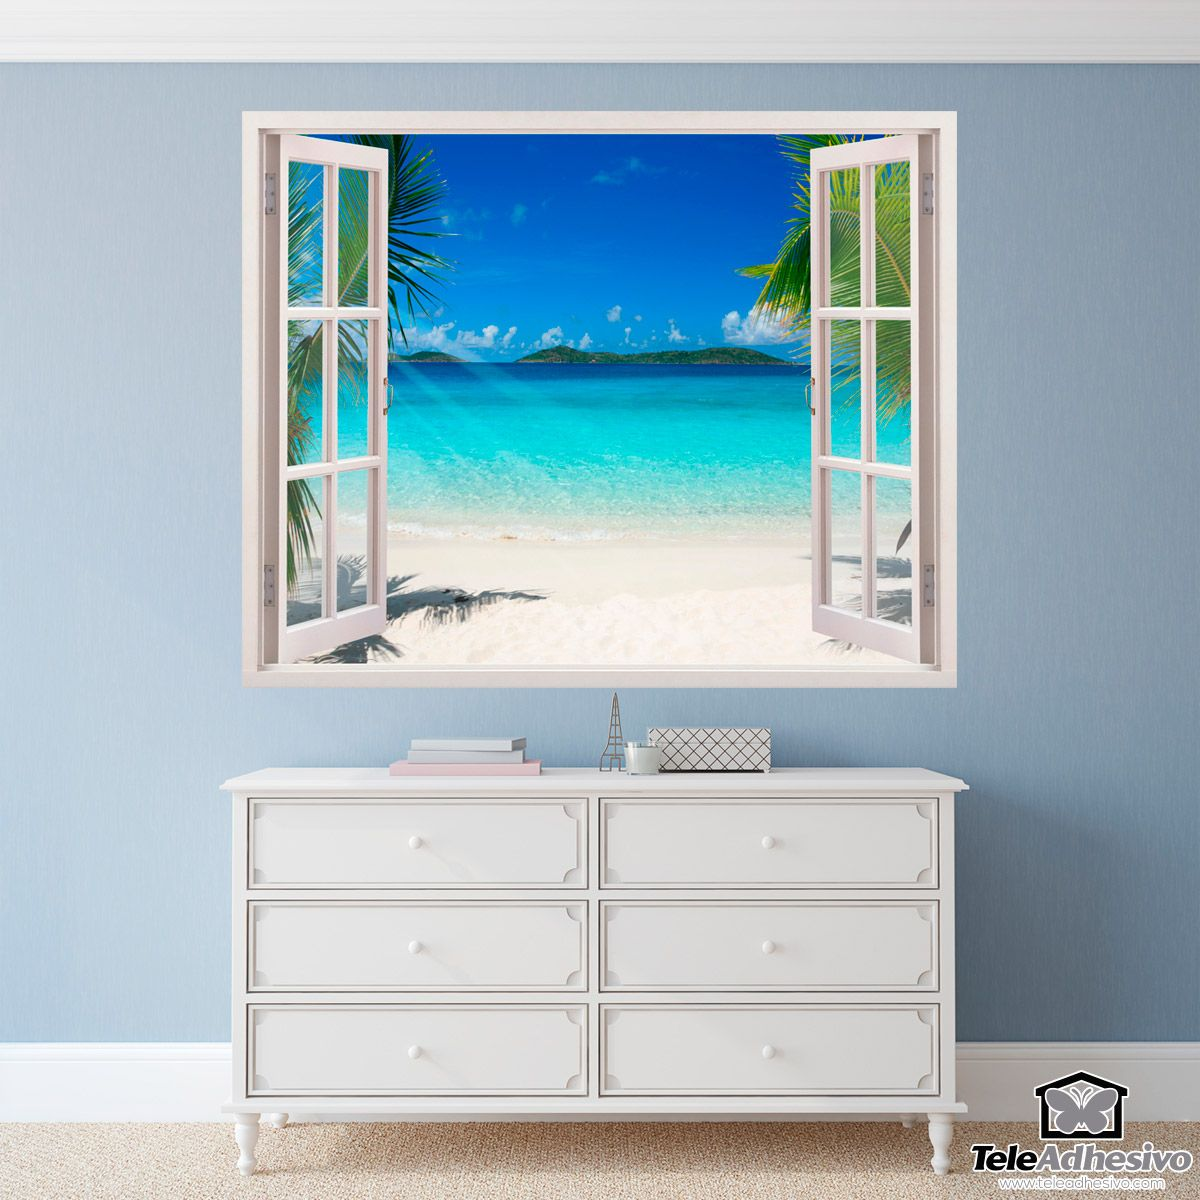 Adesivi Murali Finte Finestre.Adesivi Murali Spiaggia Caraibica Adesivi Murali Finestre Nel 2019